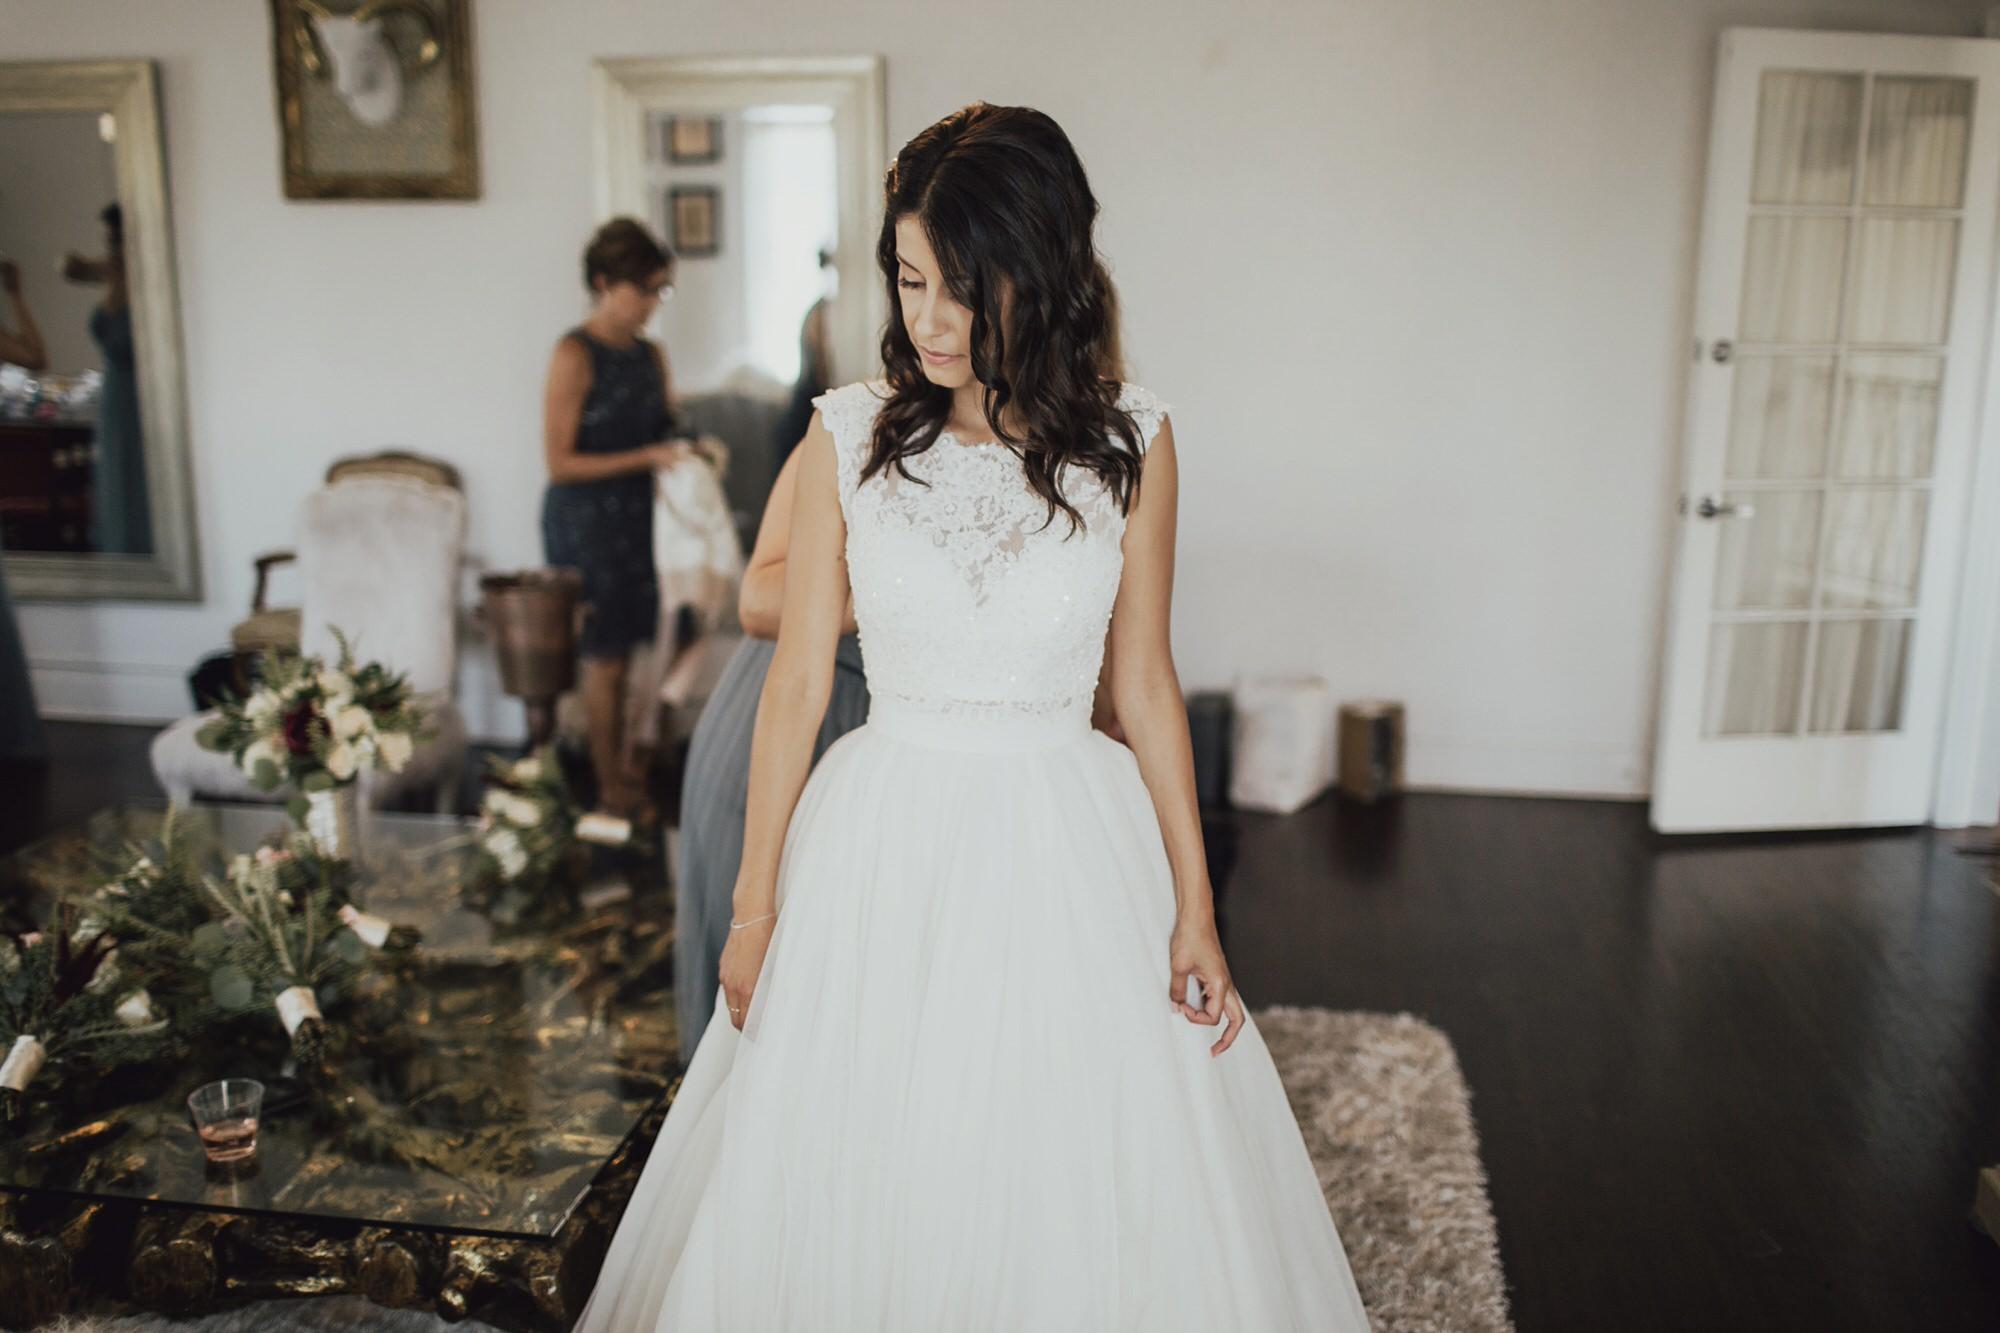 christine getting in her wedding dress